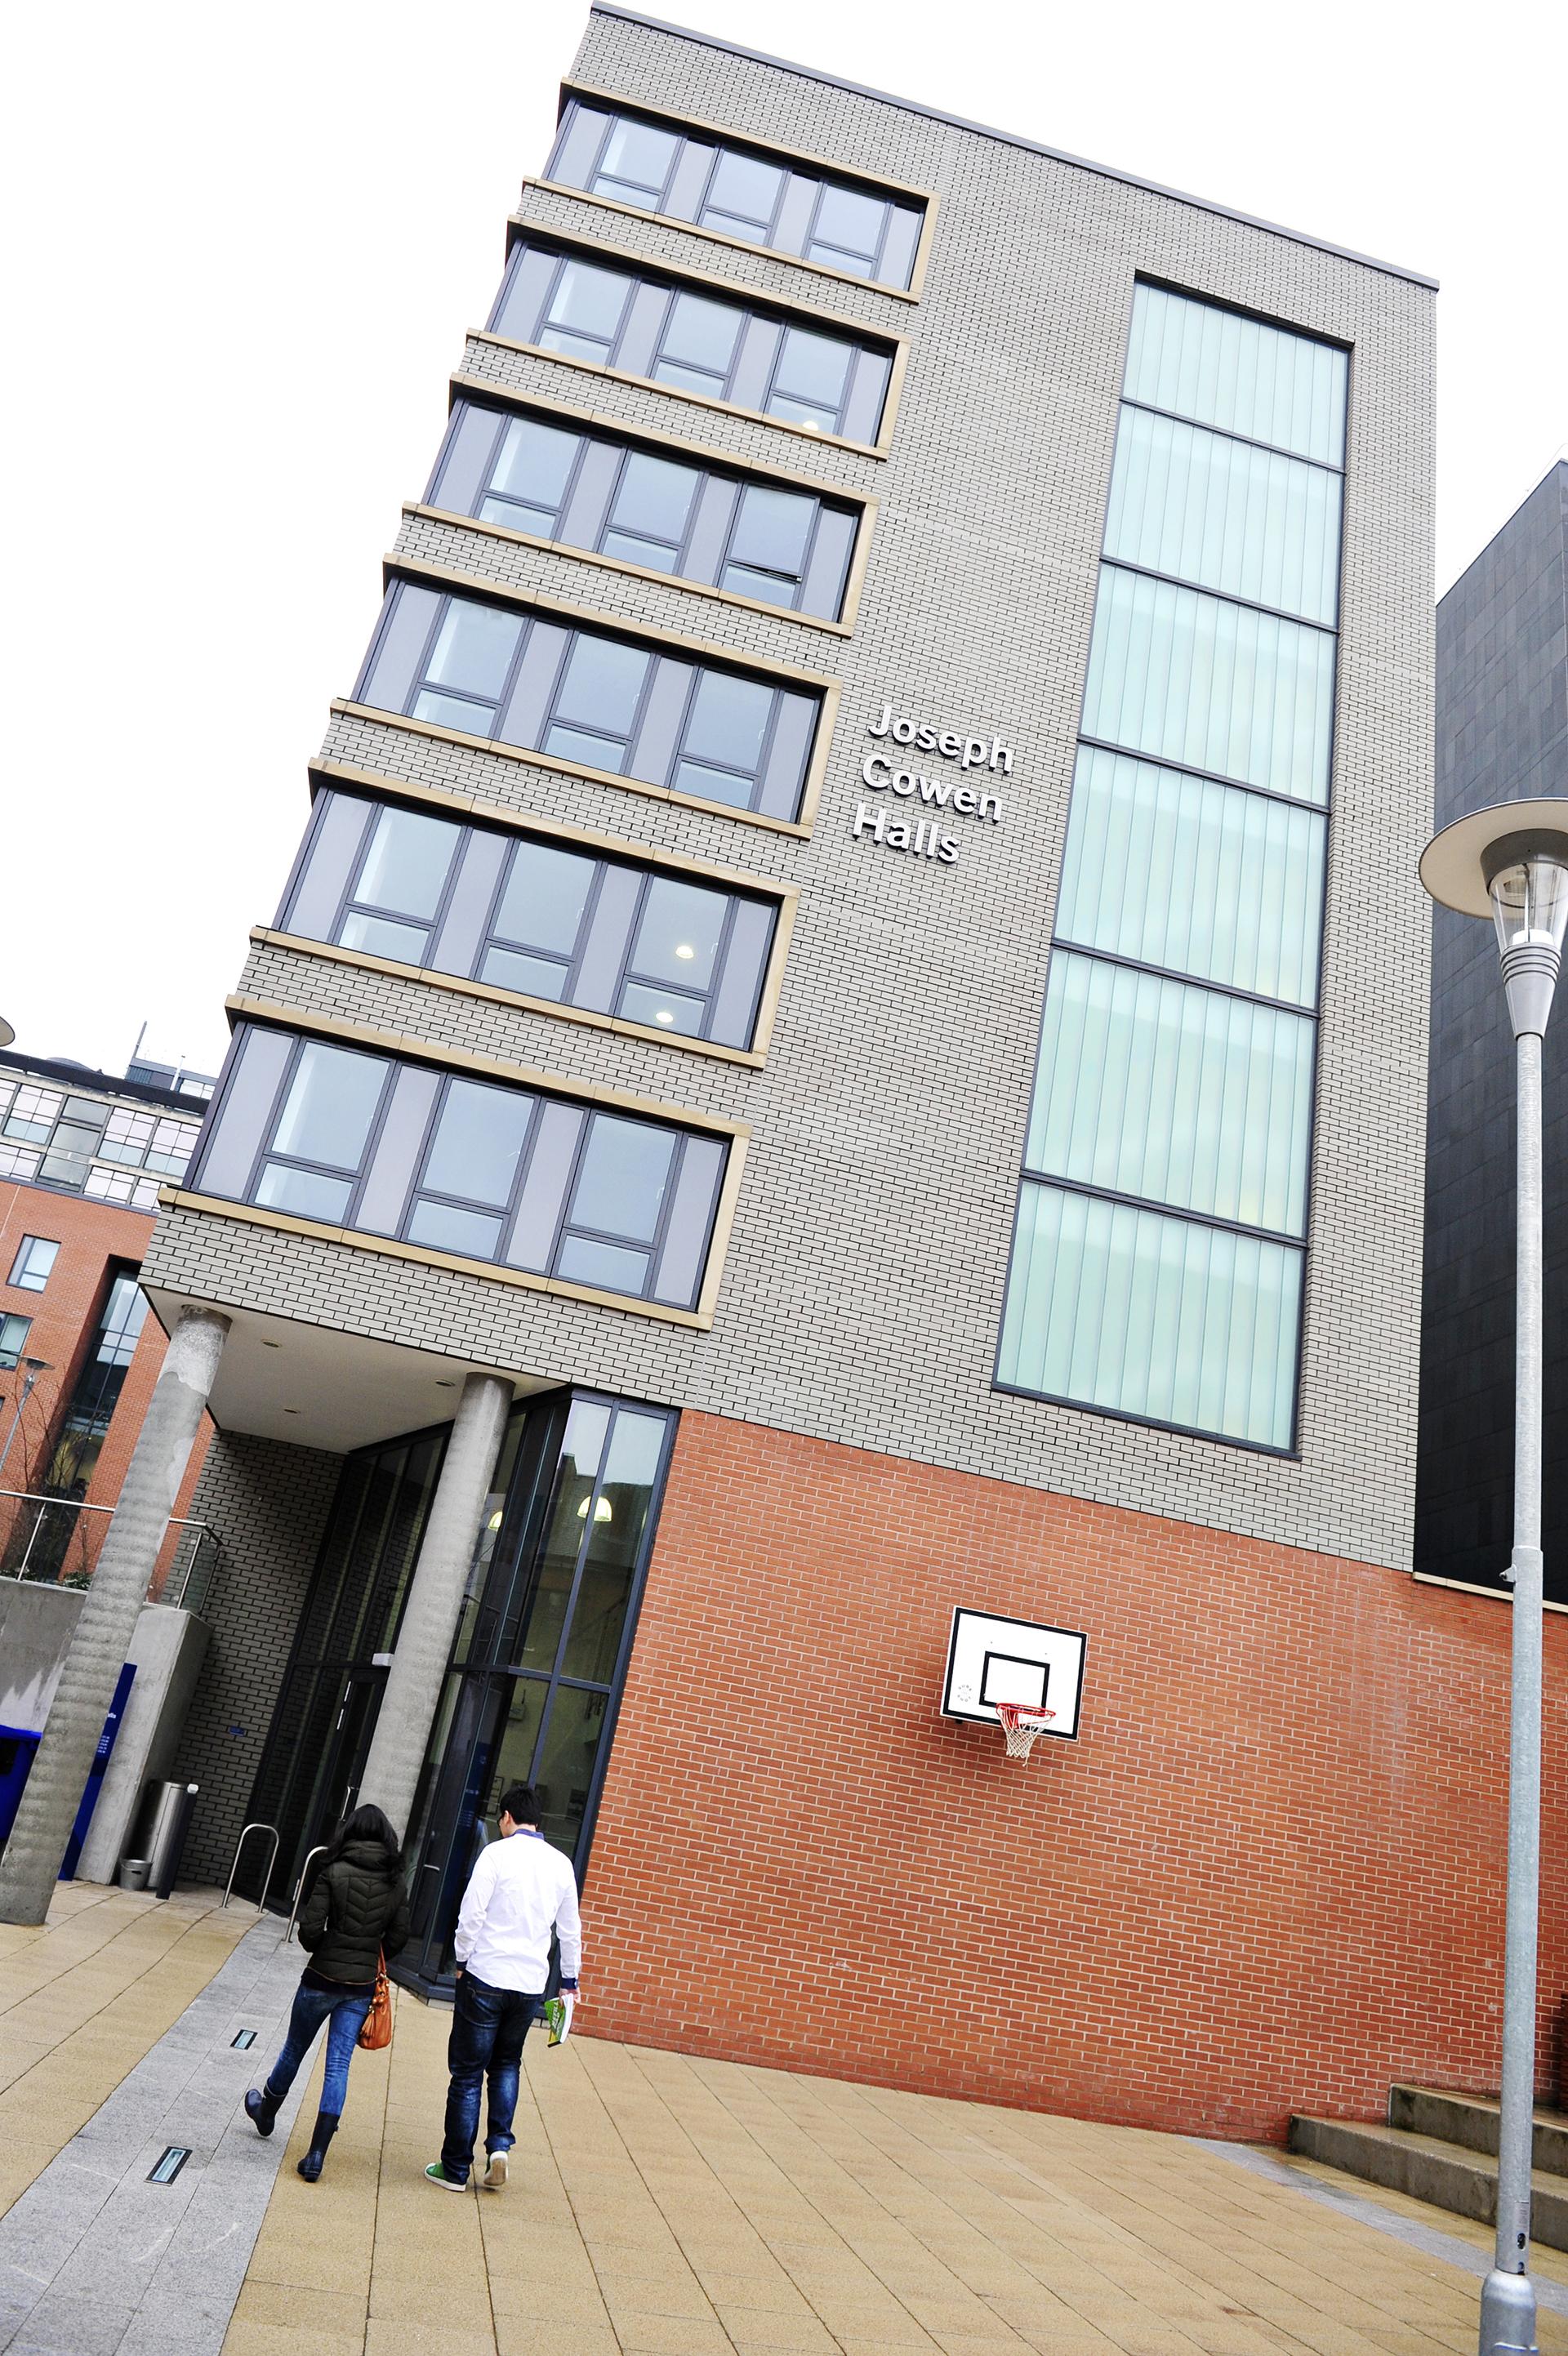 Exterior view of Joseph Cowen Halls at INTO Newcastle University